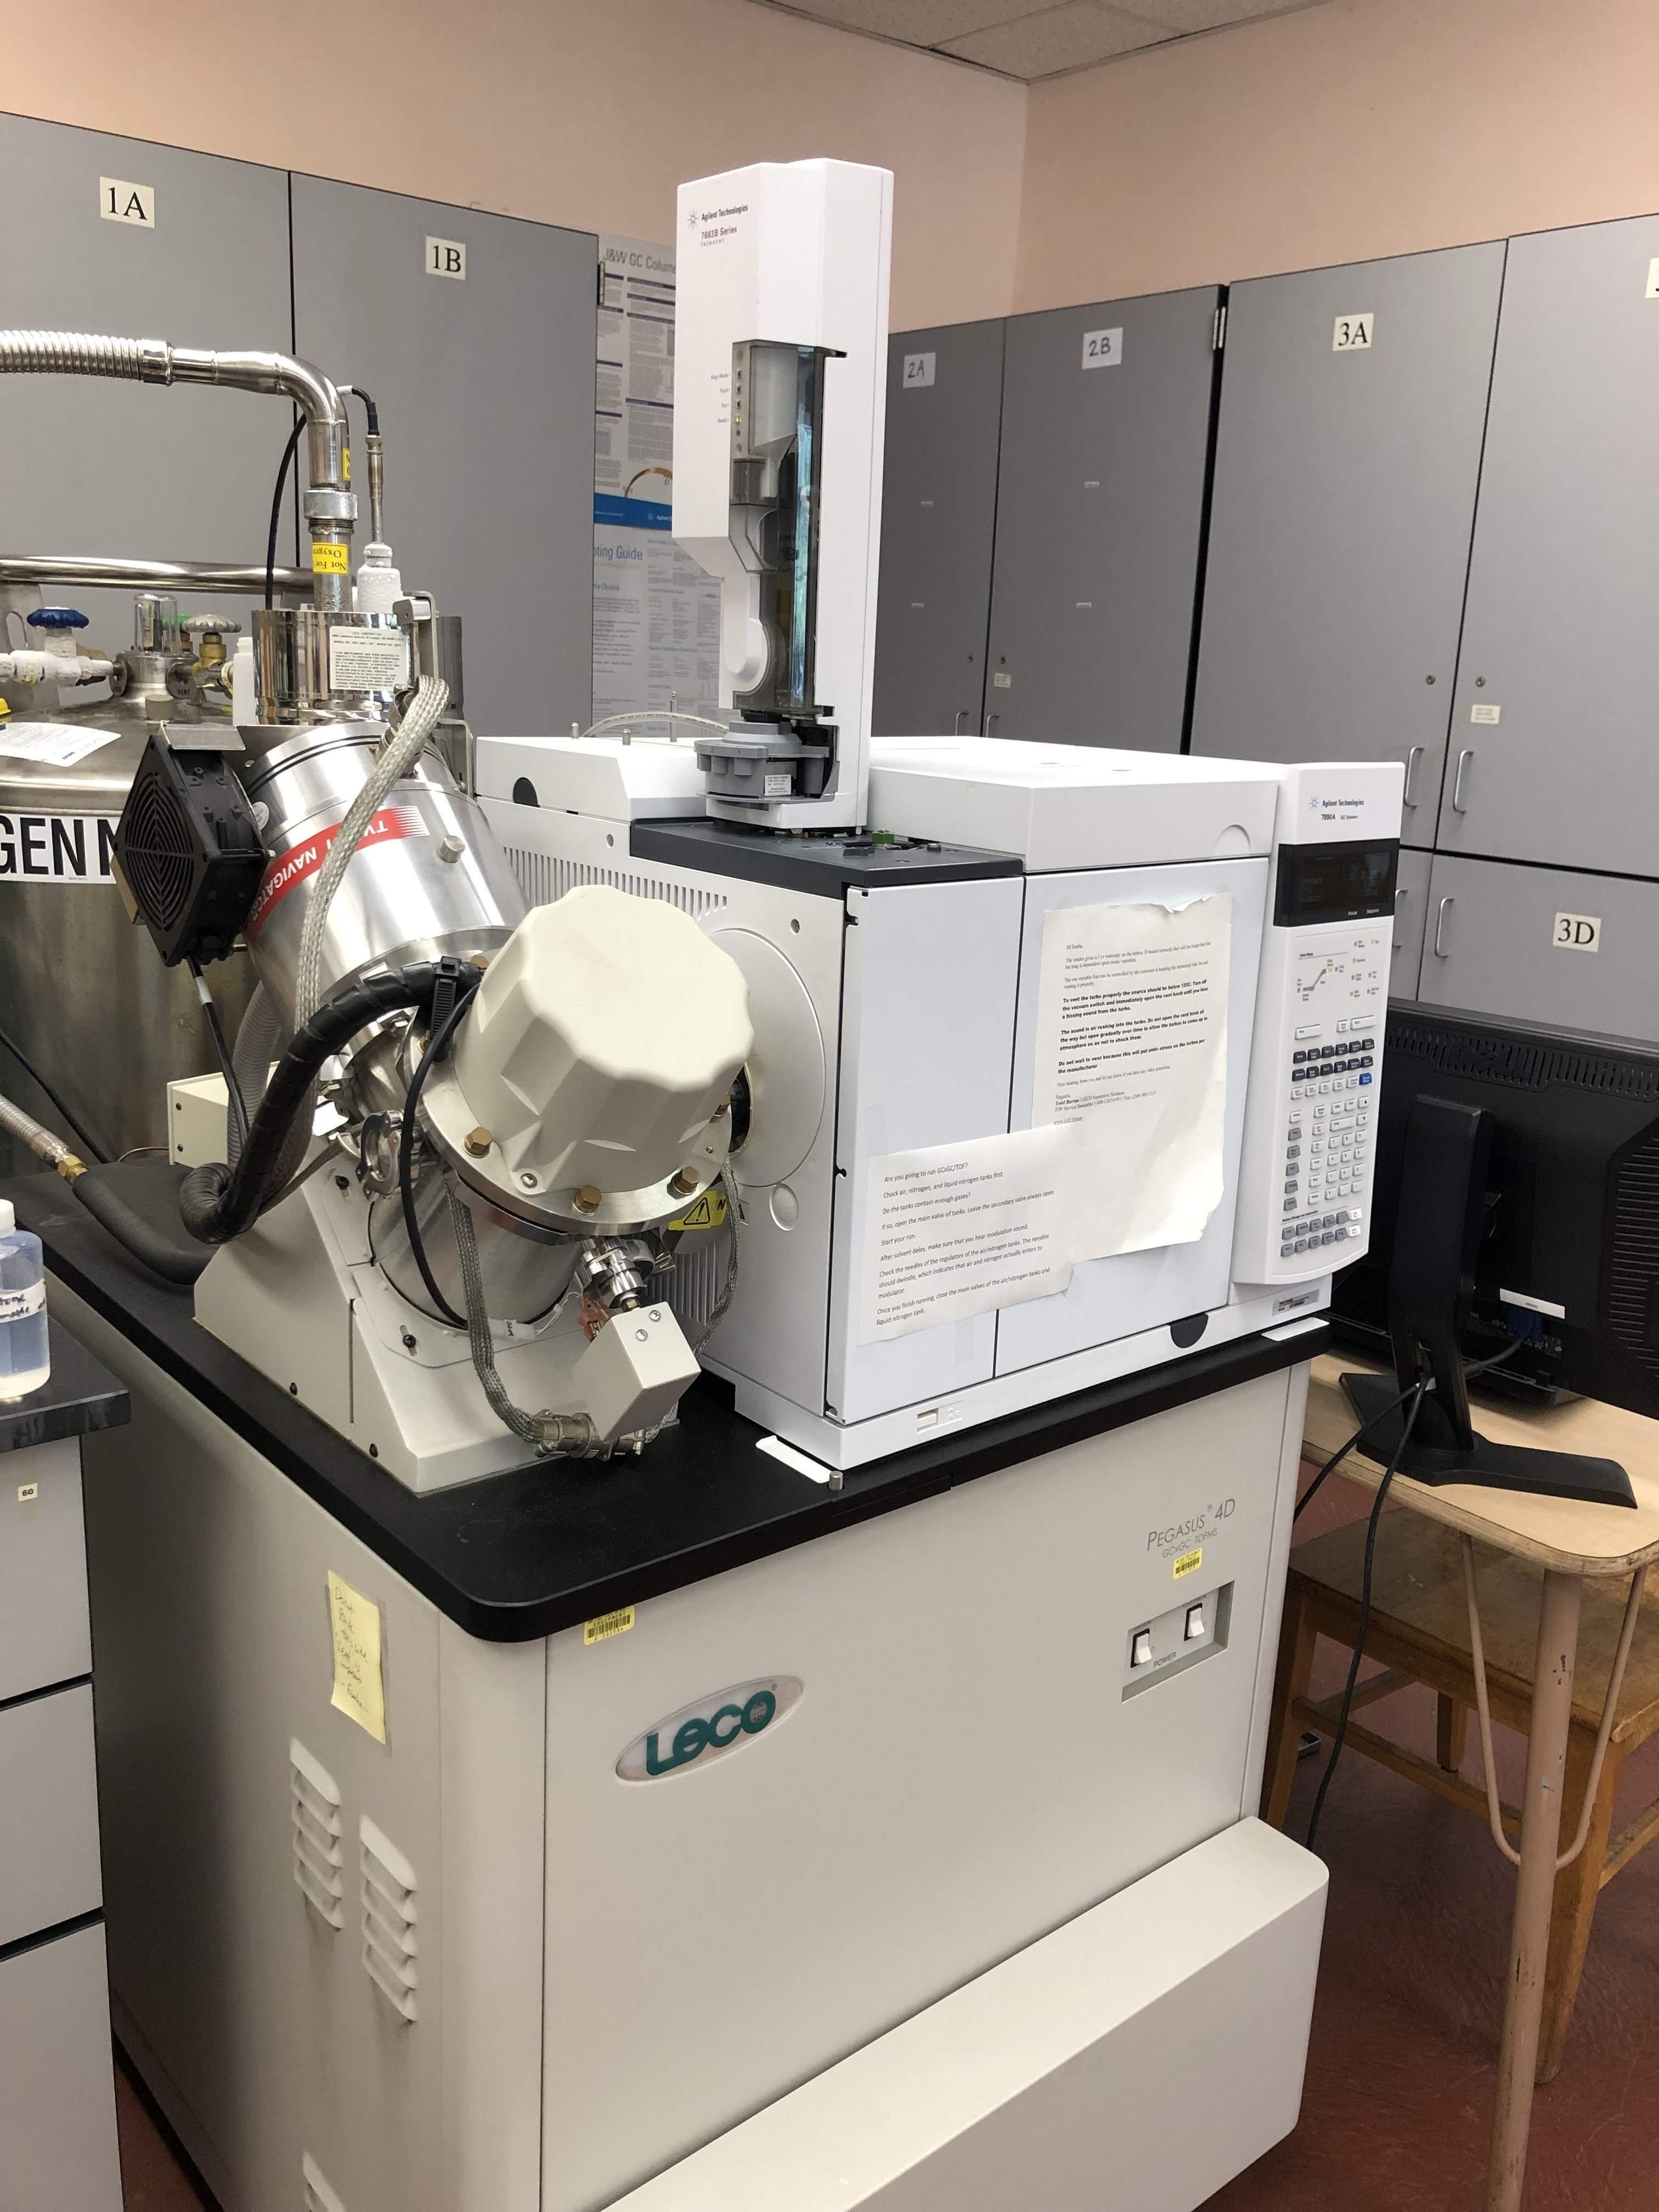 Leco Pegasus 4D comprehensive two-dimensional gas chromatograph time-of-flight mass spectrometer (GC×GC/TOF-MS)